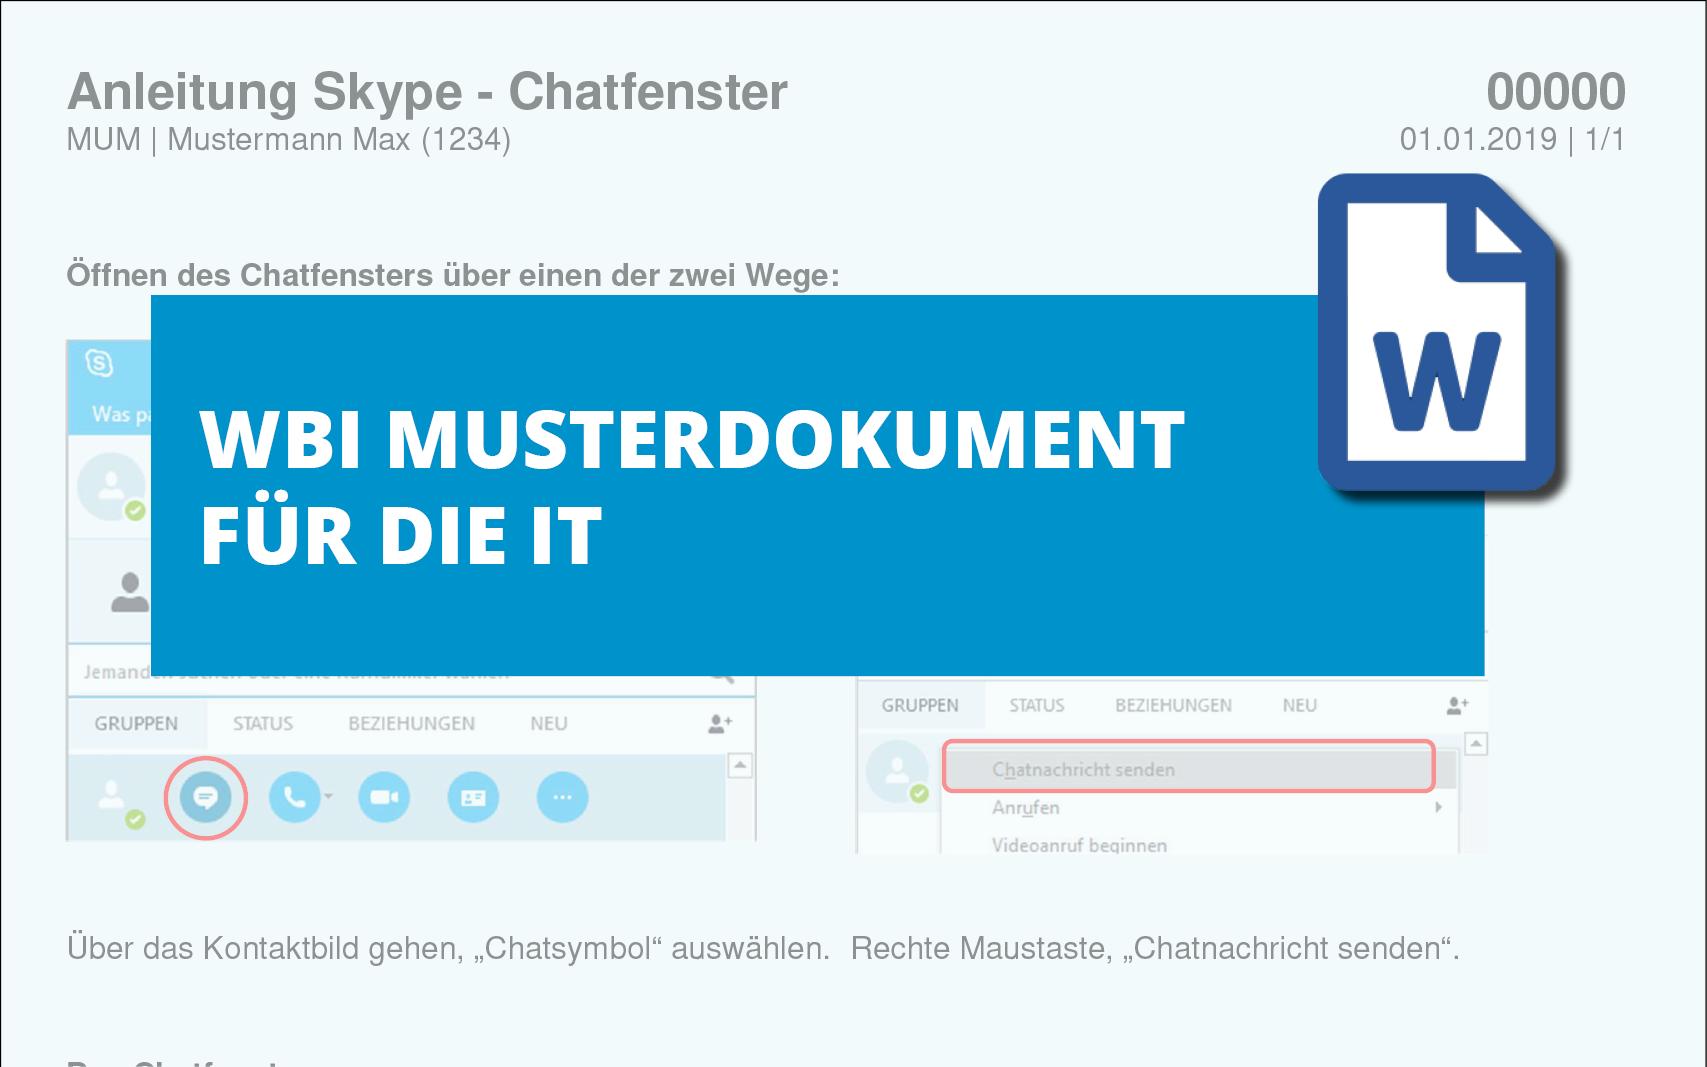 anleitung-skype-chatfenster